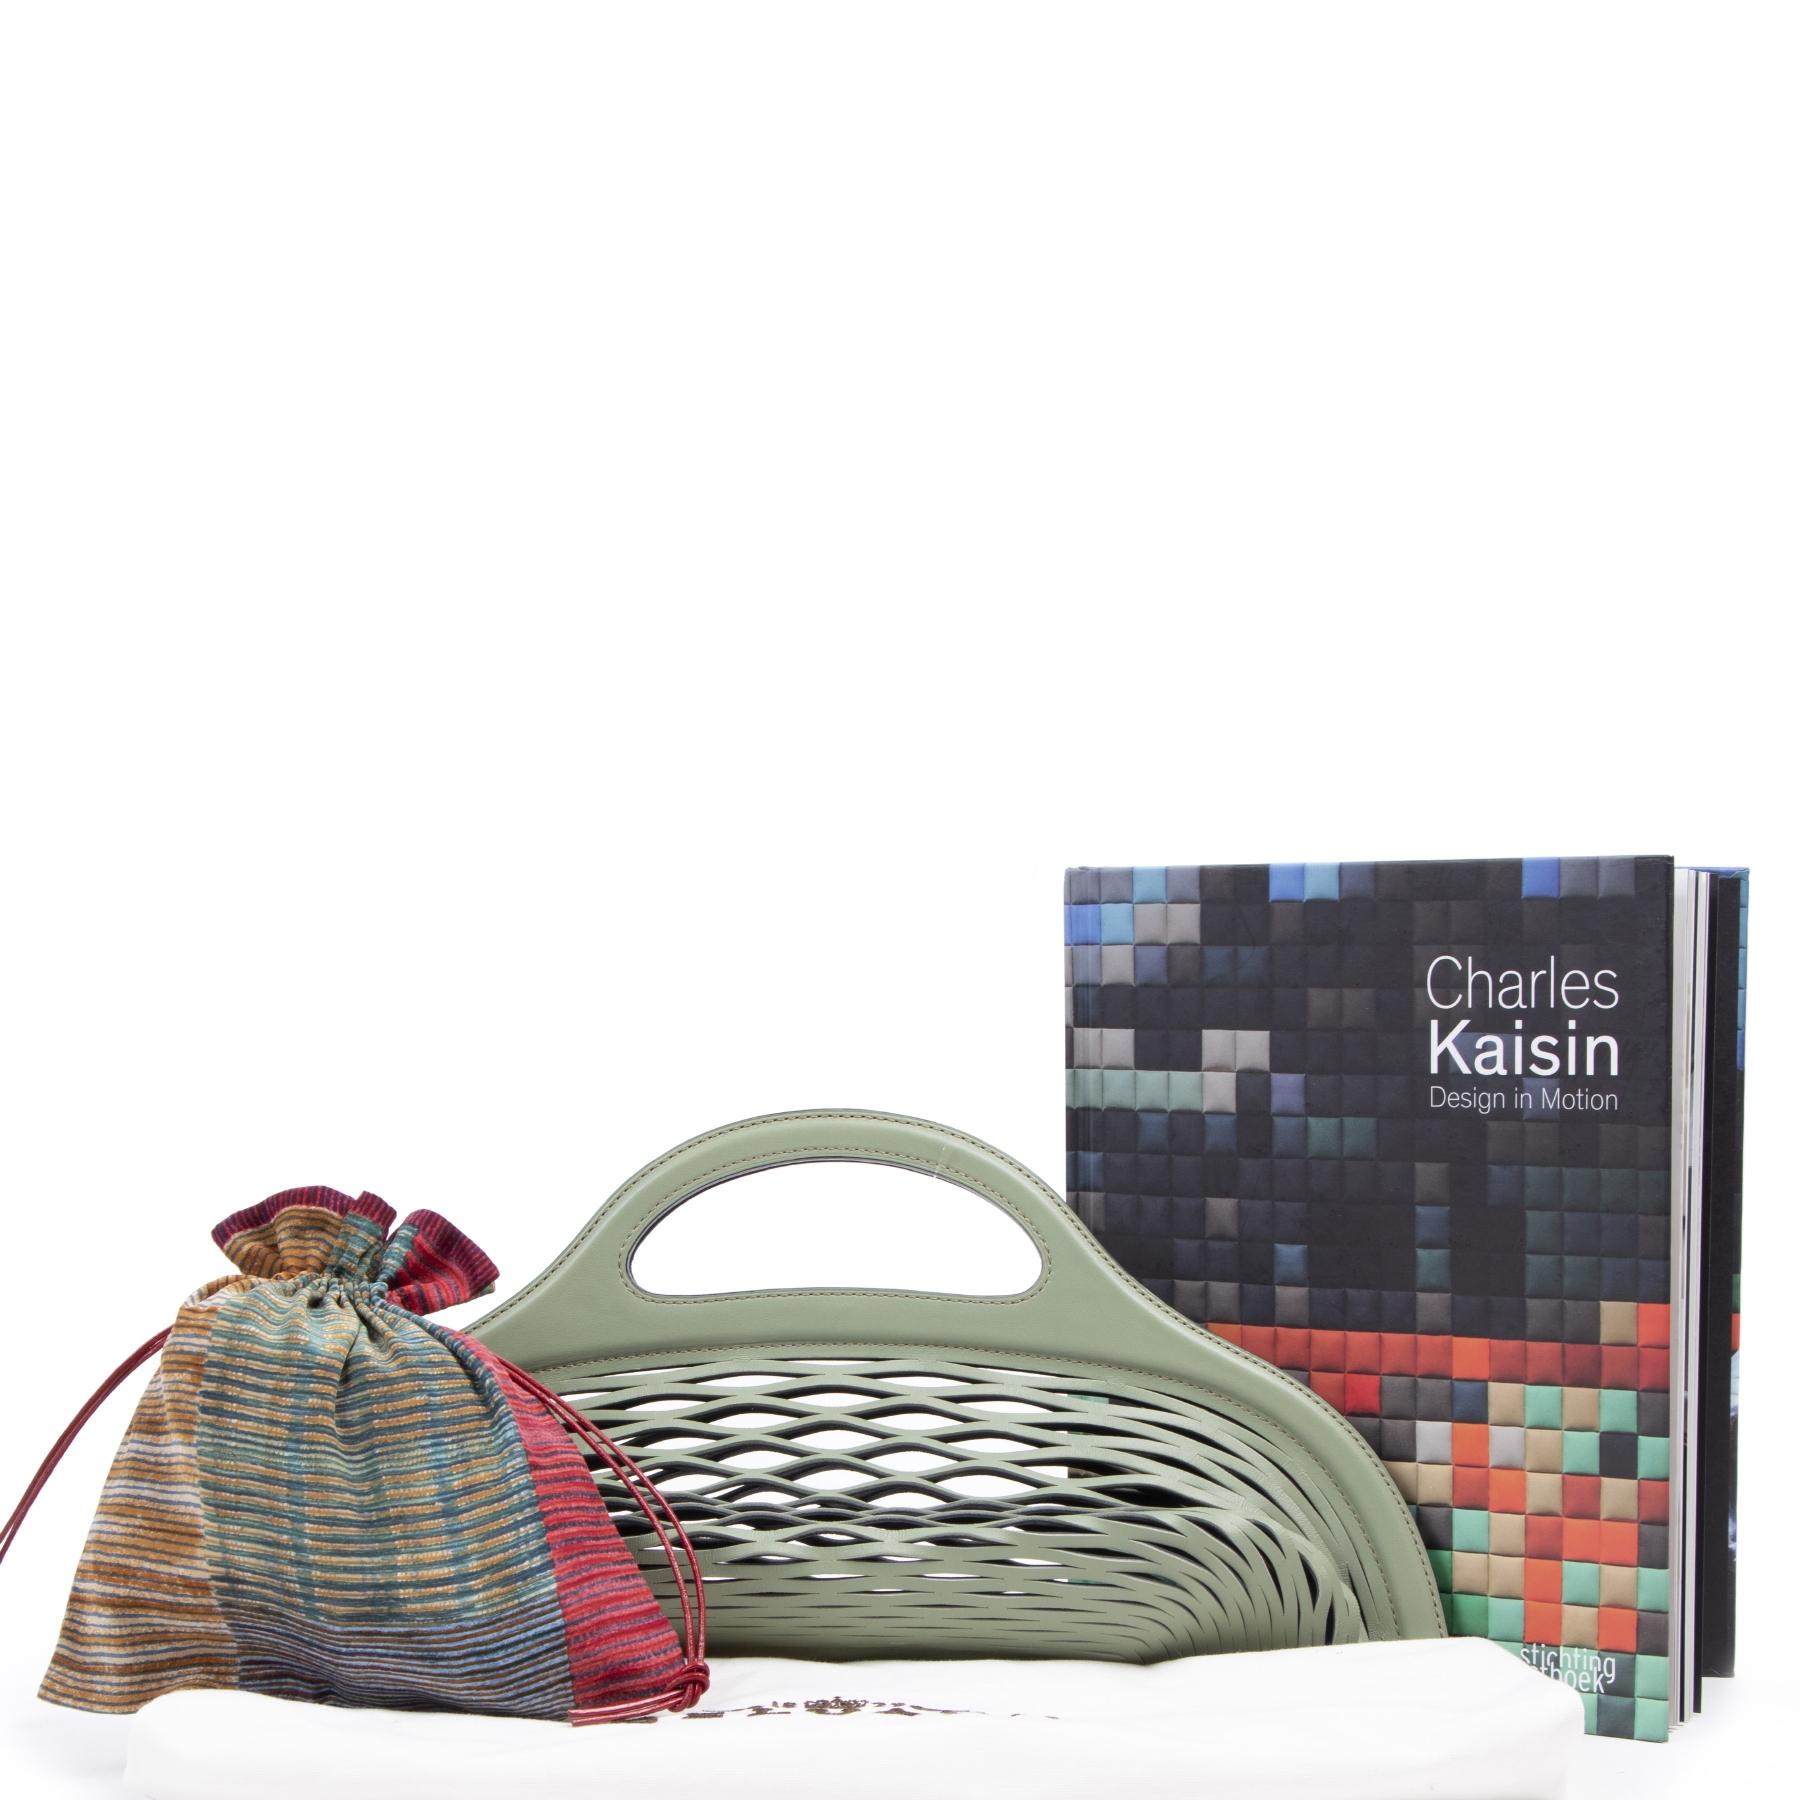 Delvaux Limited Edition Black Kaisin Basket Bag